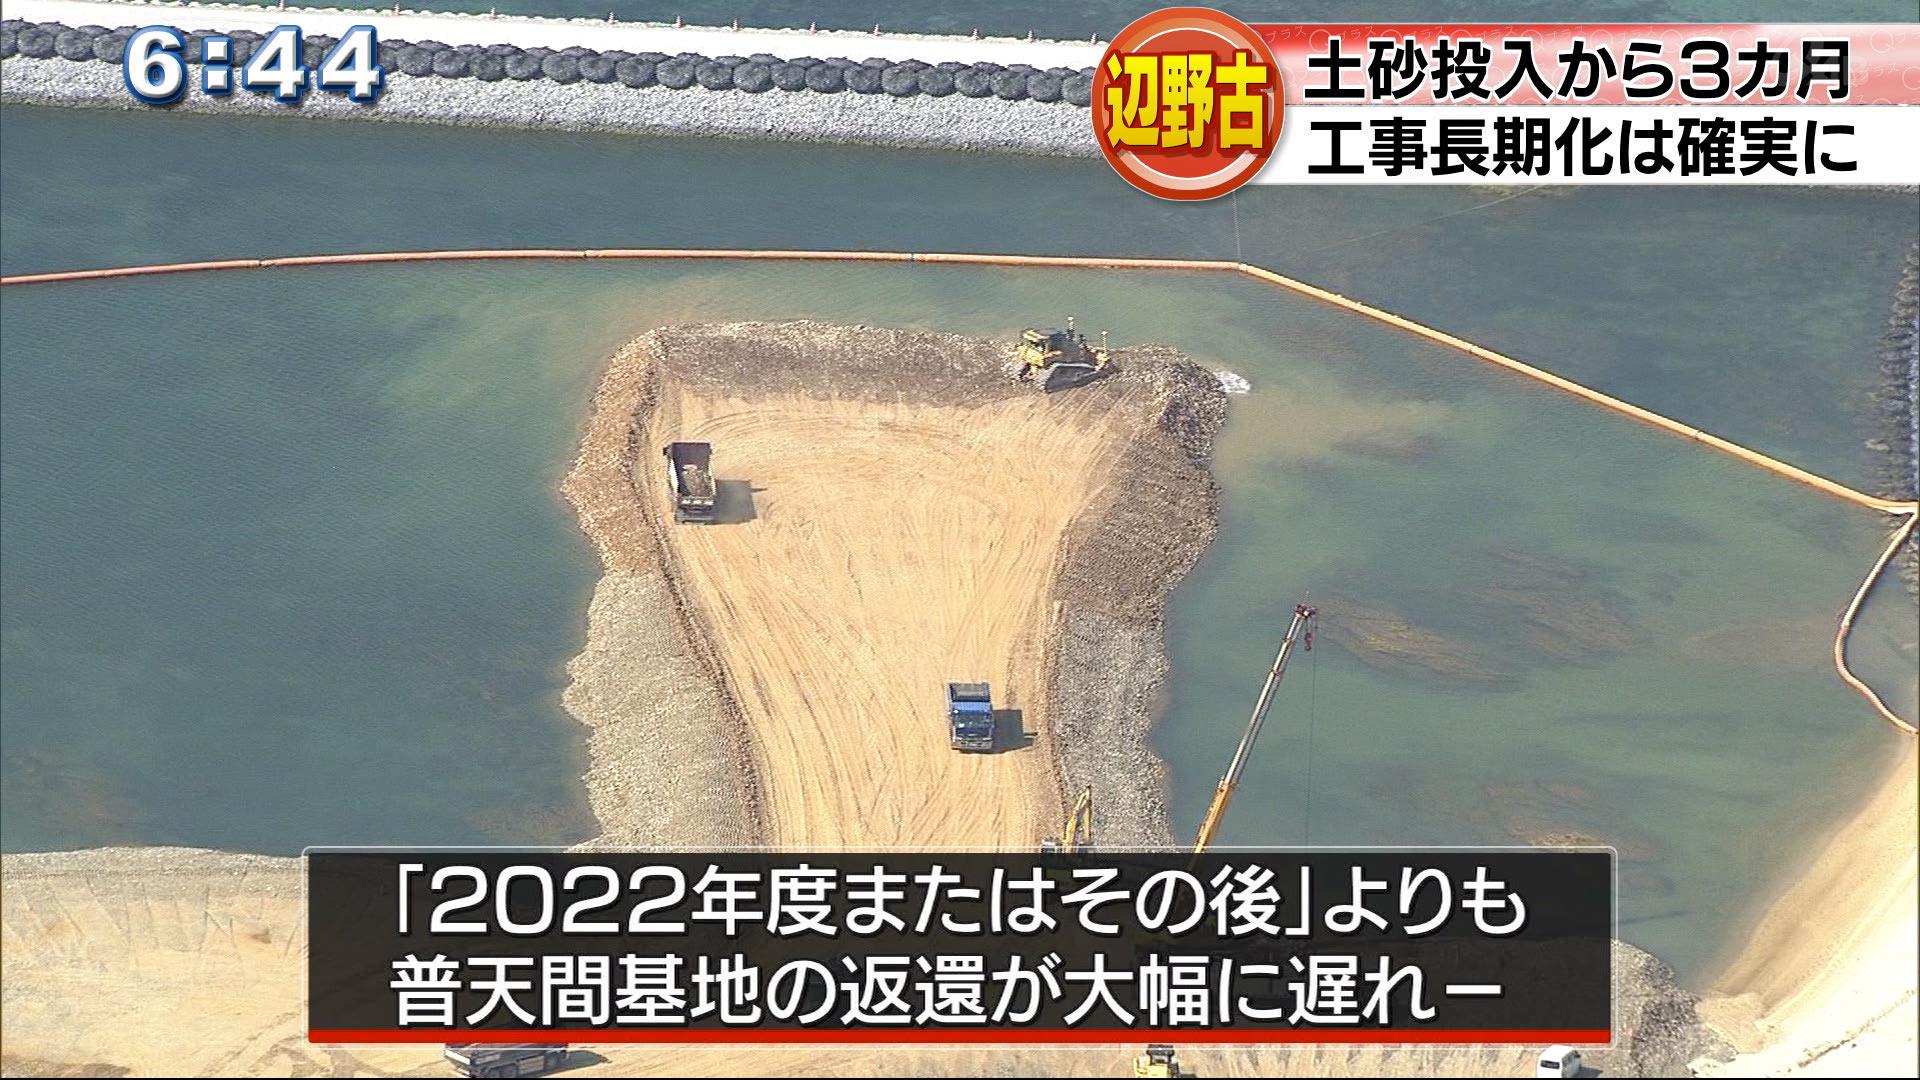 土砂投入3カ月 安全性疑問の新基地 工事長期化へ